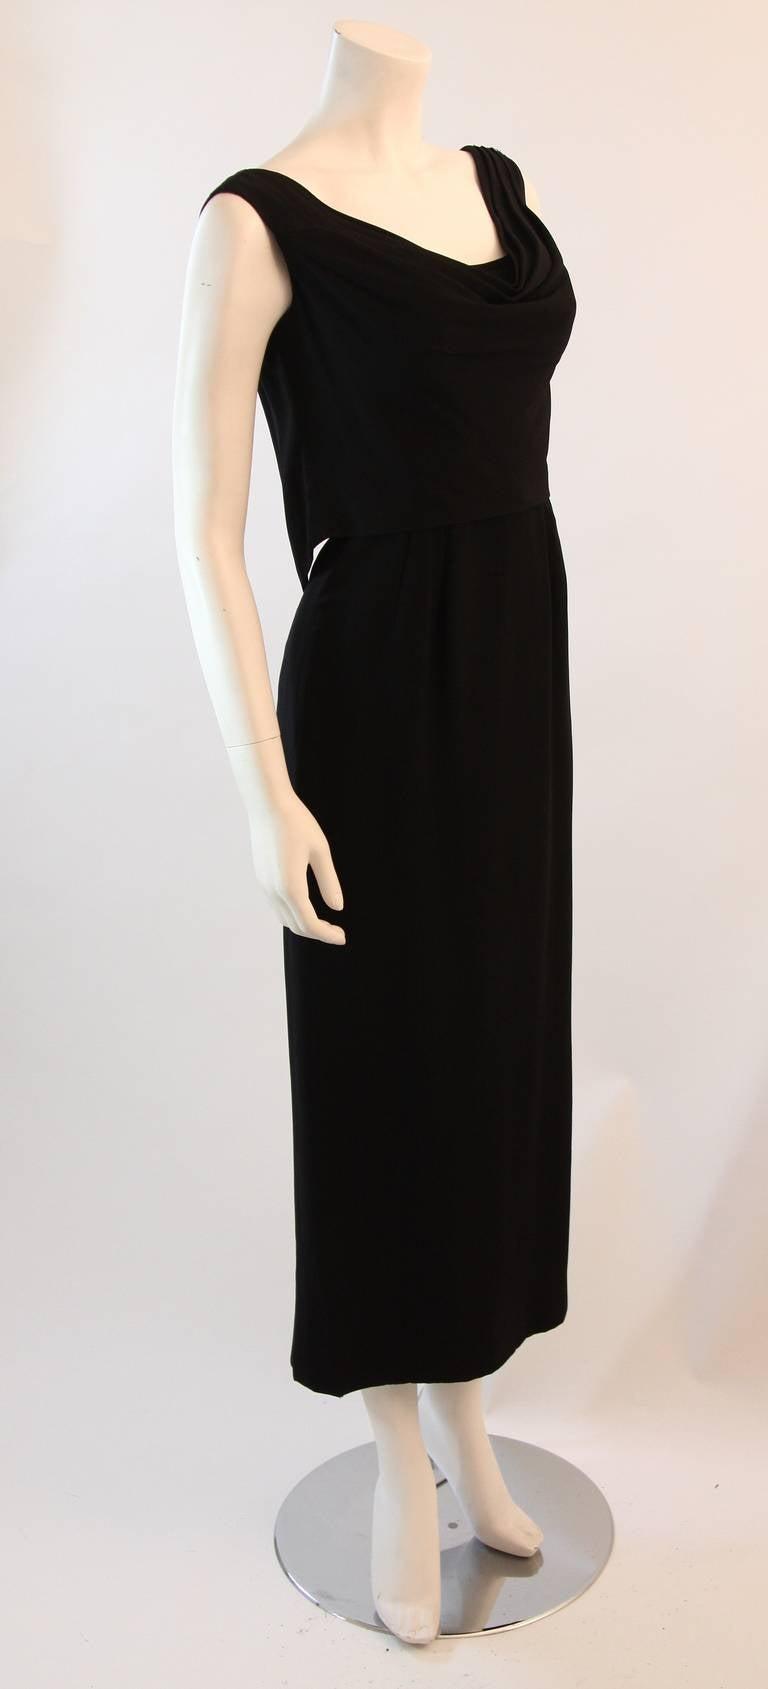 Dorothy O'Hara Black Silk Crepe Gown with Drape front split back design 5